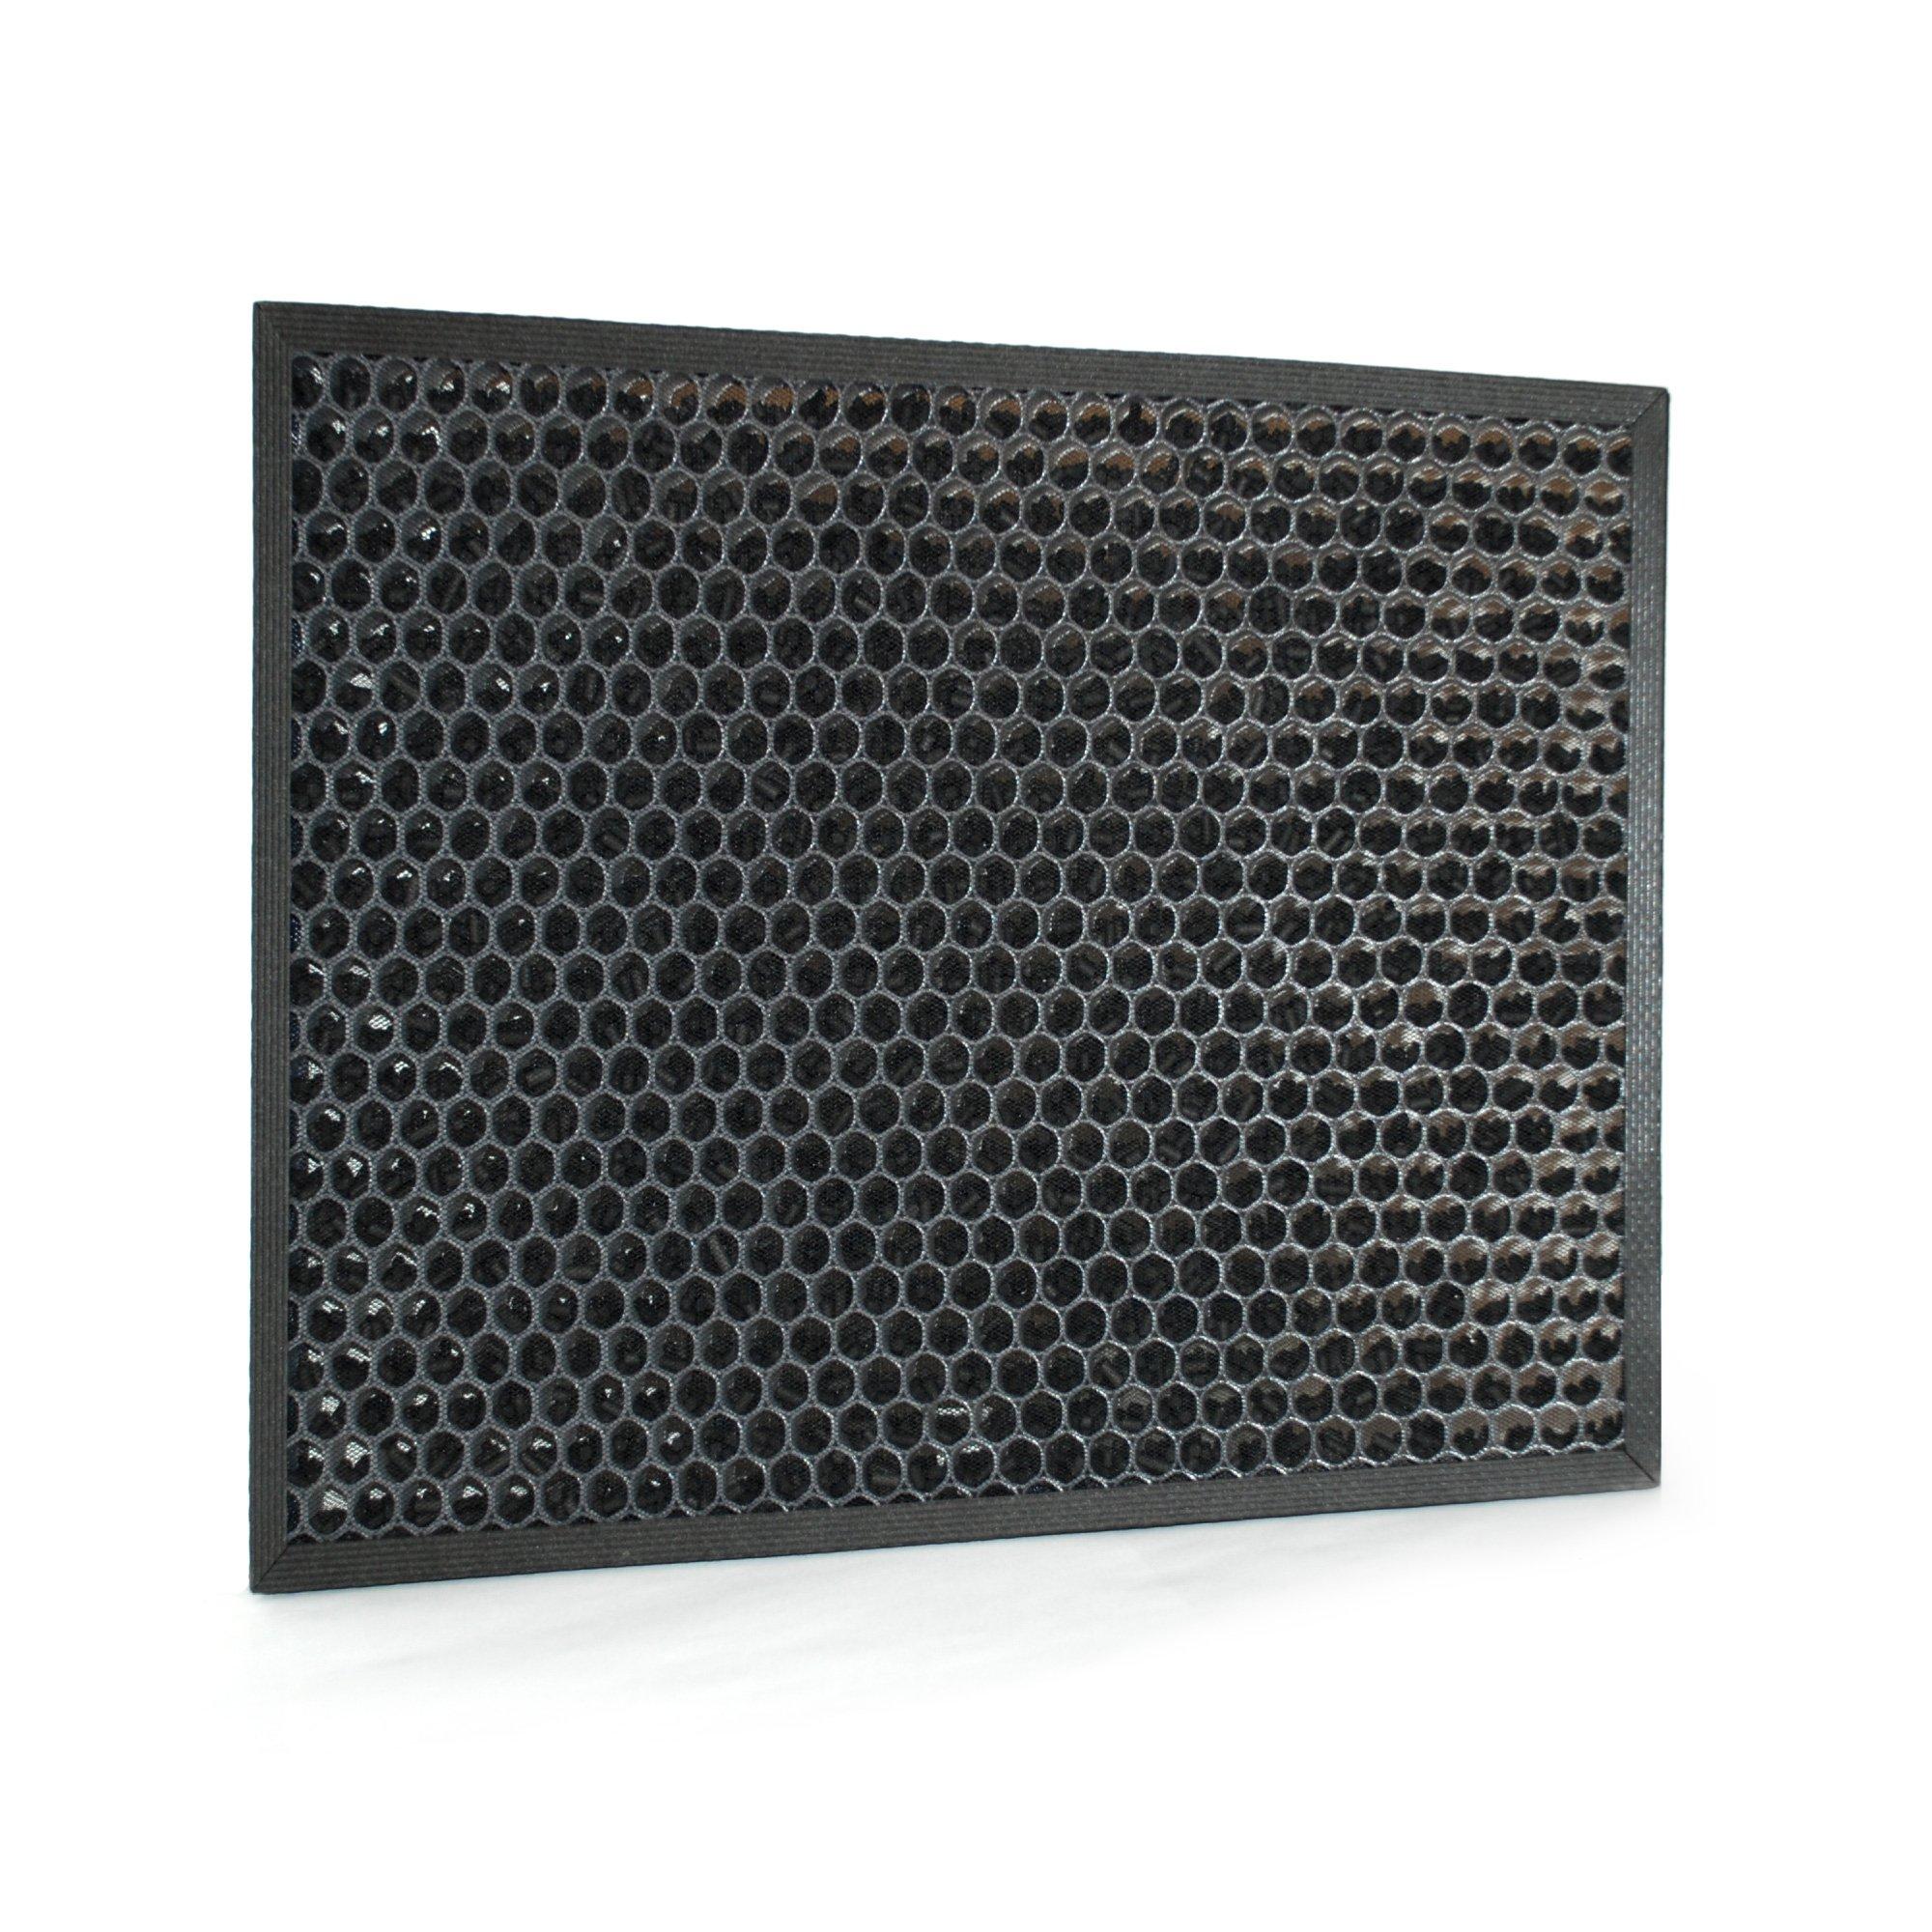 activated carbon filter cag plast plastik